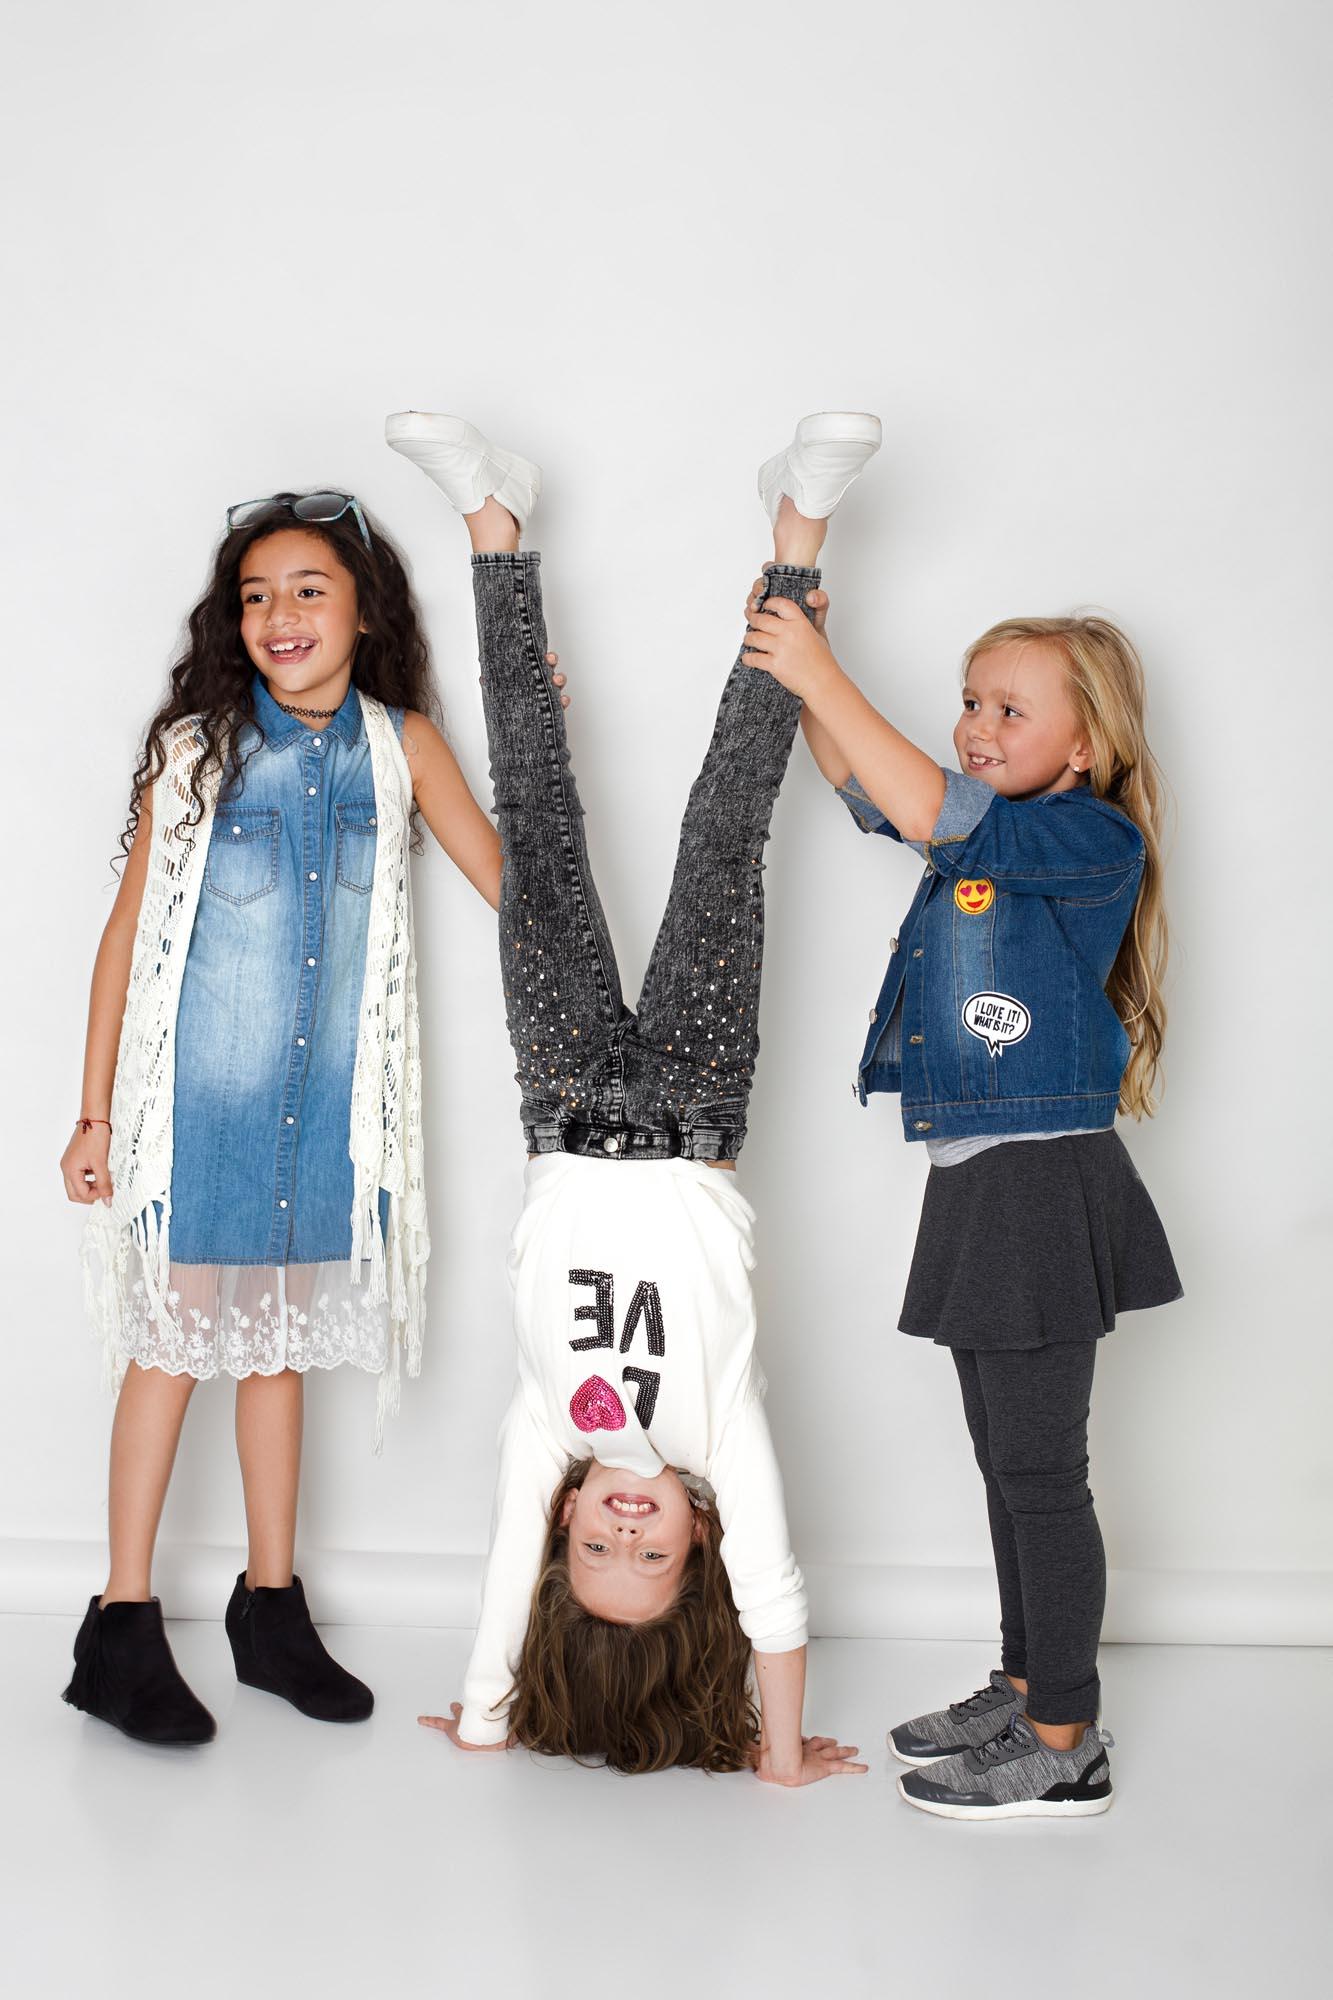 nyc-photographers-kids-modeling-10010.jpg